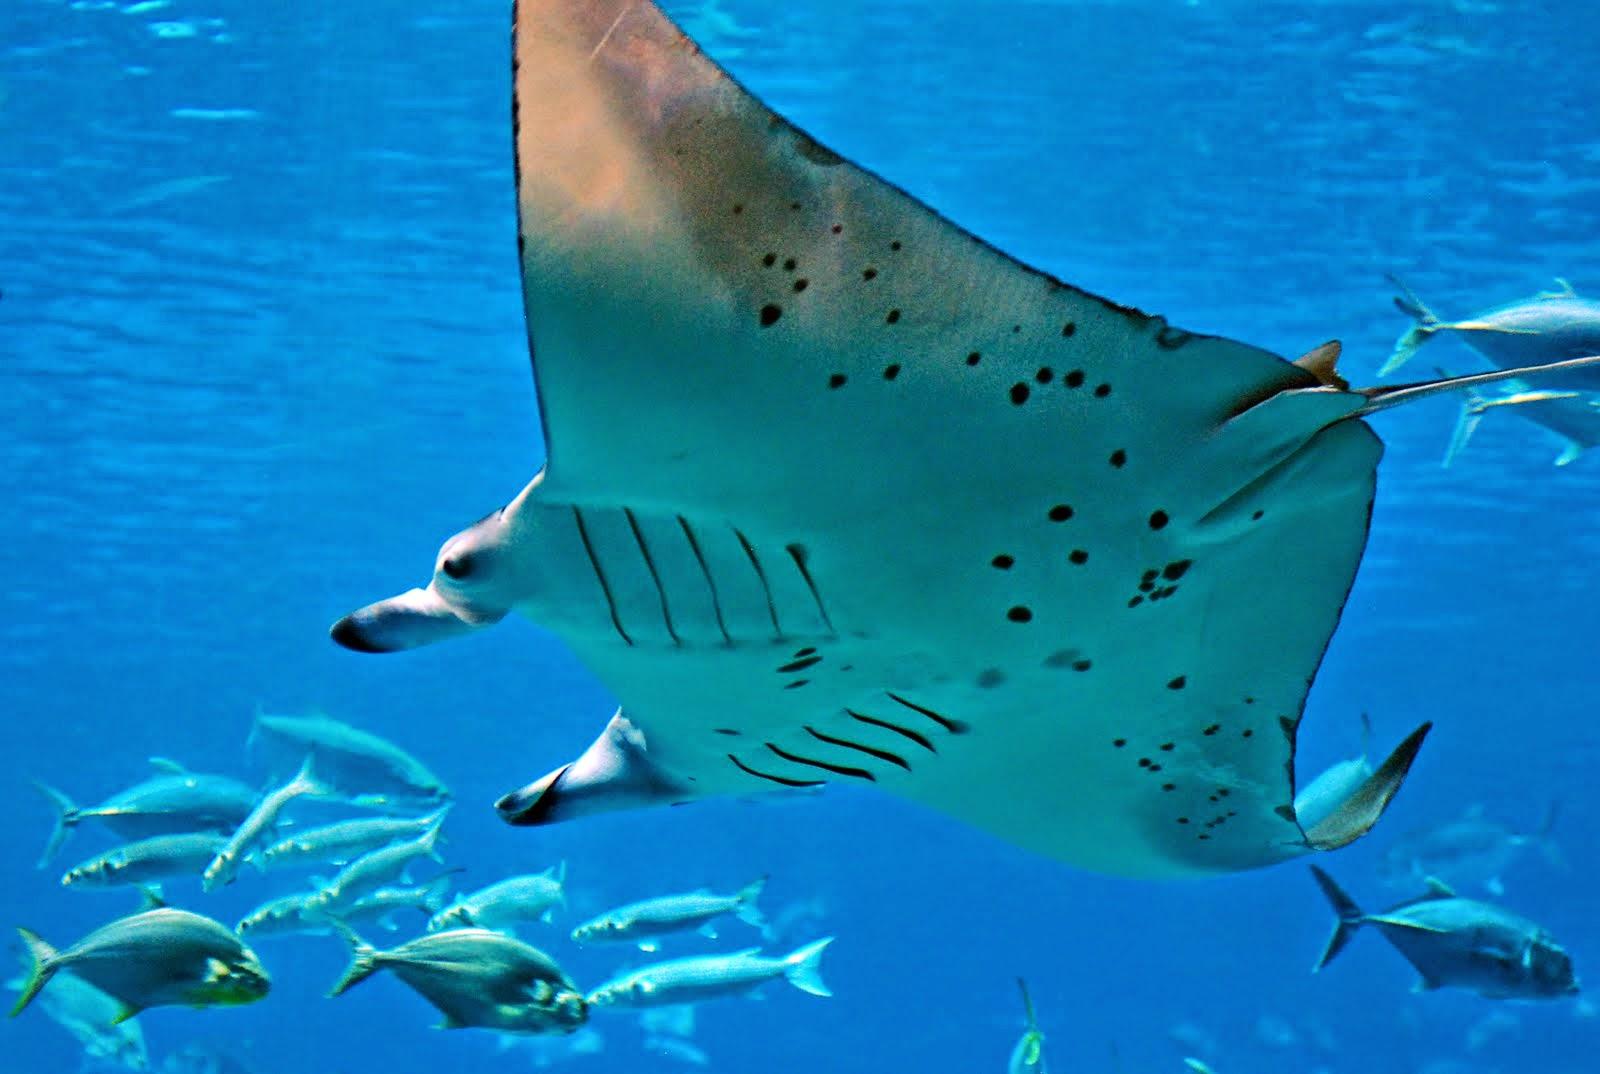 Morcego-do-mar